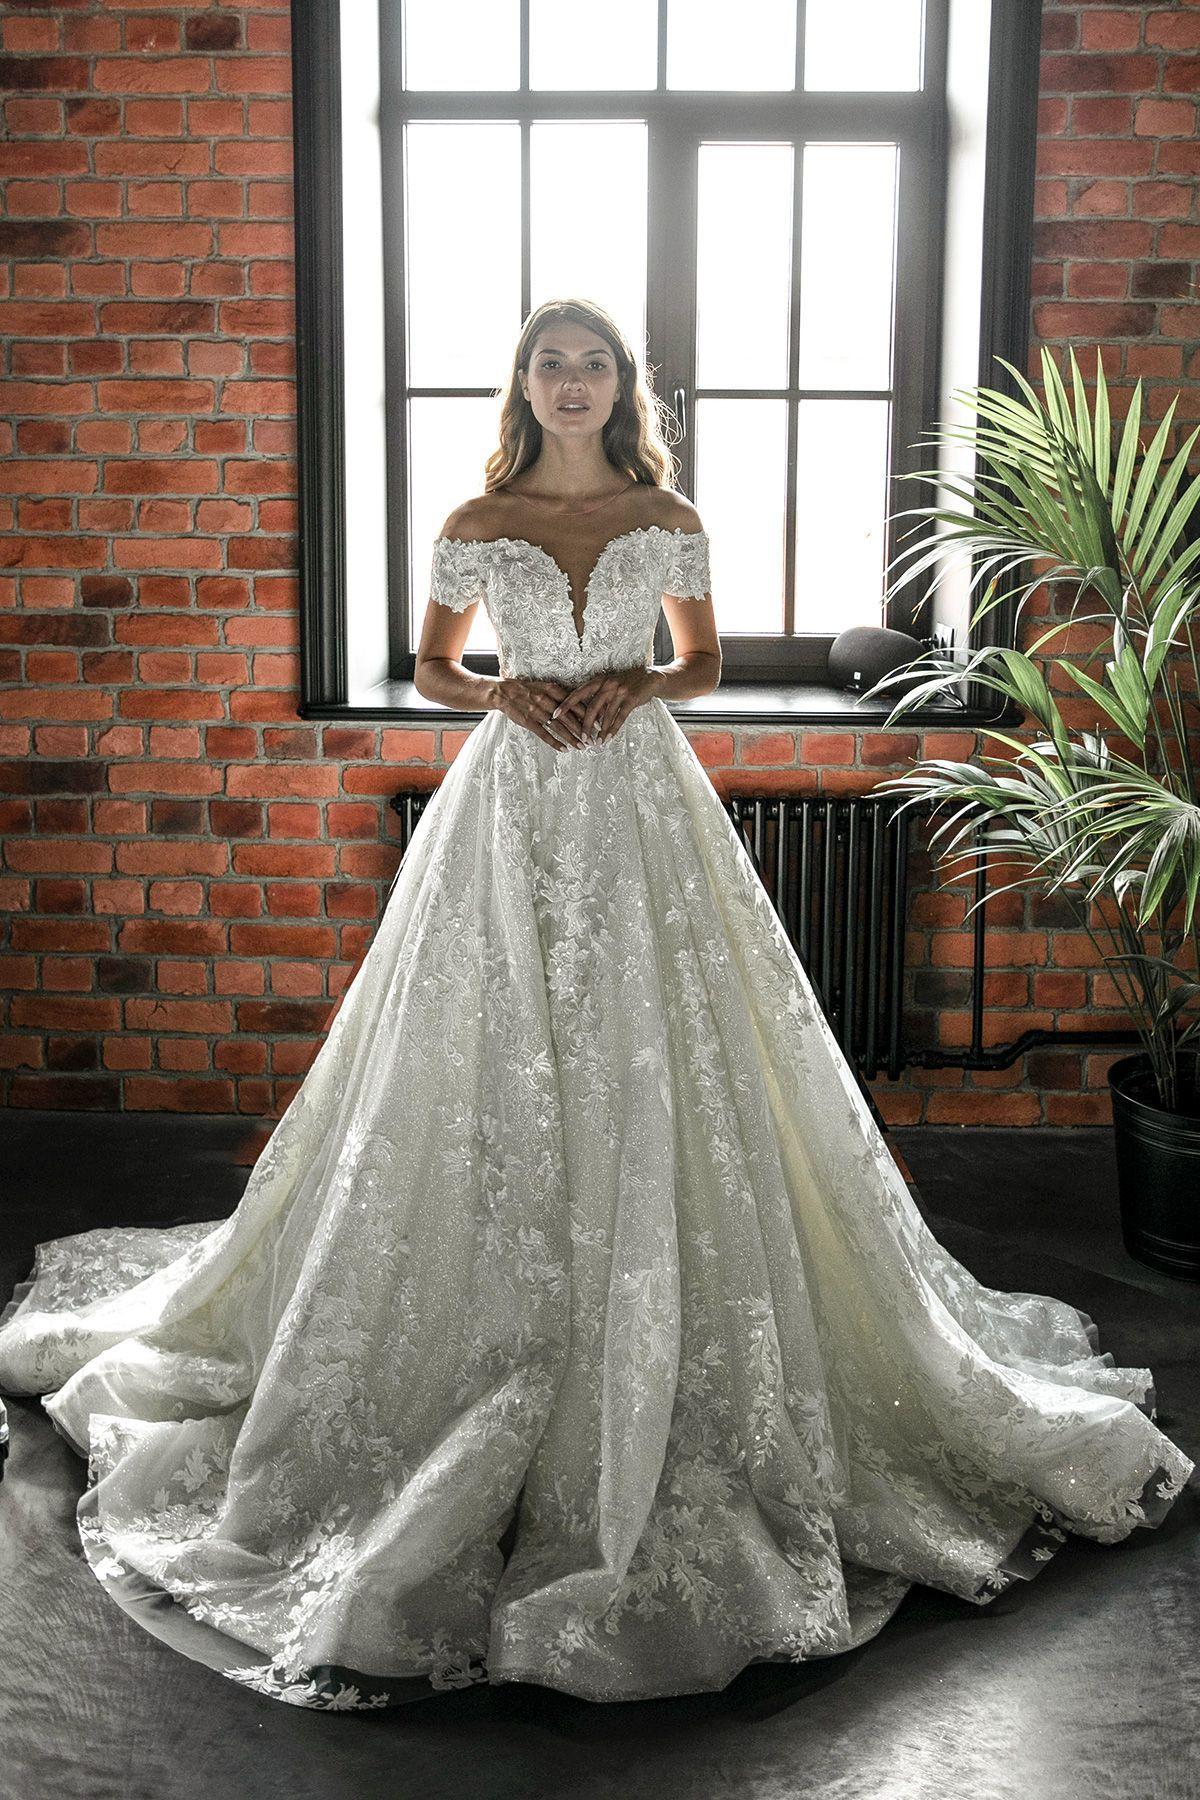 Airis By Olivia Bottega Ball Skirt Wedding Dress Glitter Etsy Glitter Wedding Dress Ball Dresses Off Shoulder Wedding Dress [ 1800 x 1200 Pixel ]